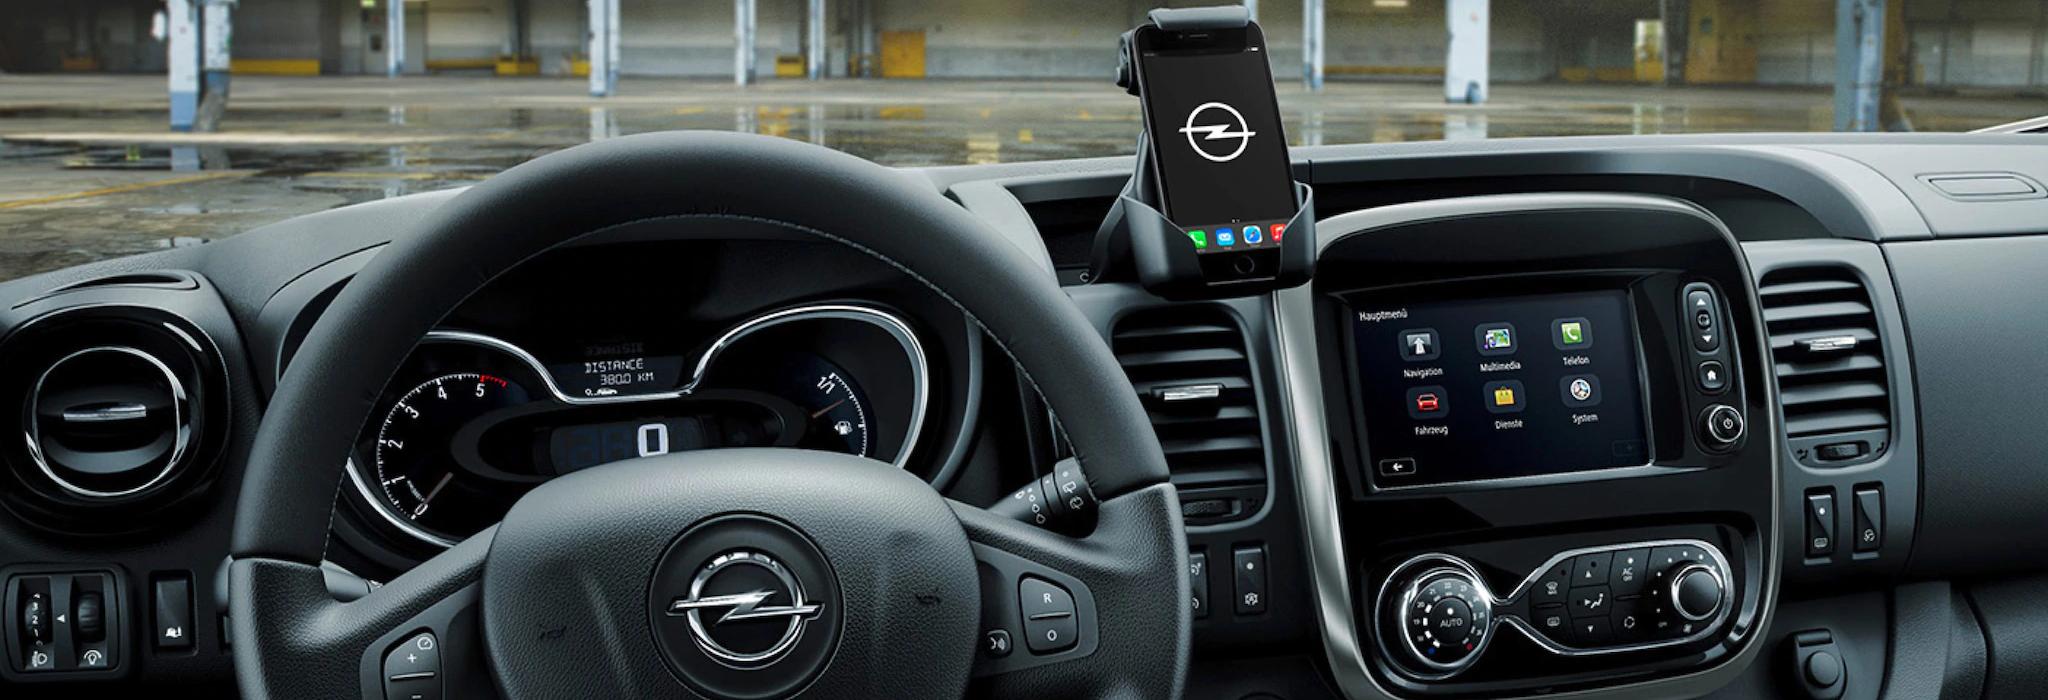 Opel_Vivaro_Tourer_Smartphone_Holder_21x9_vip18_i01_196